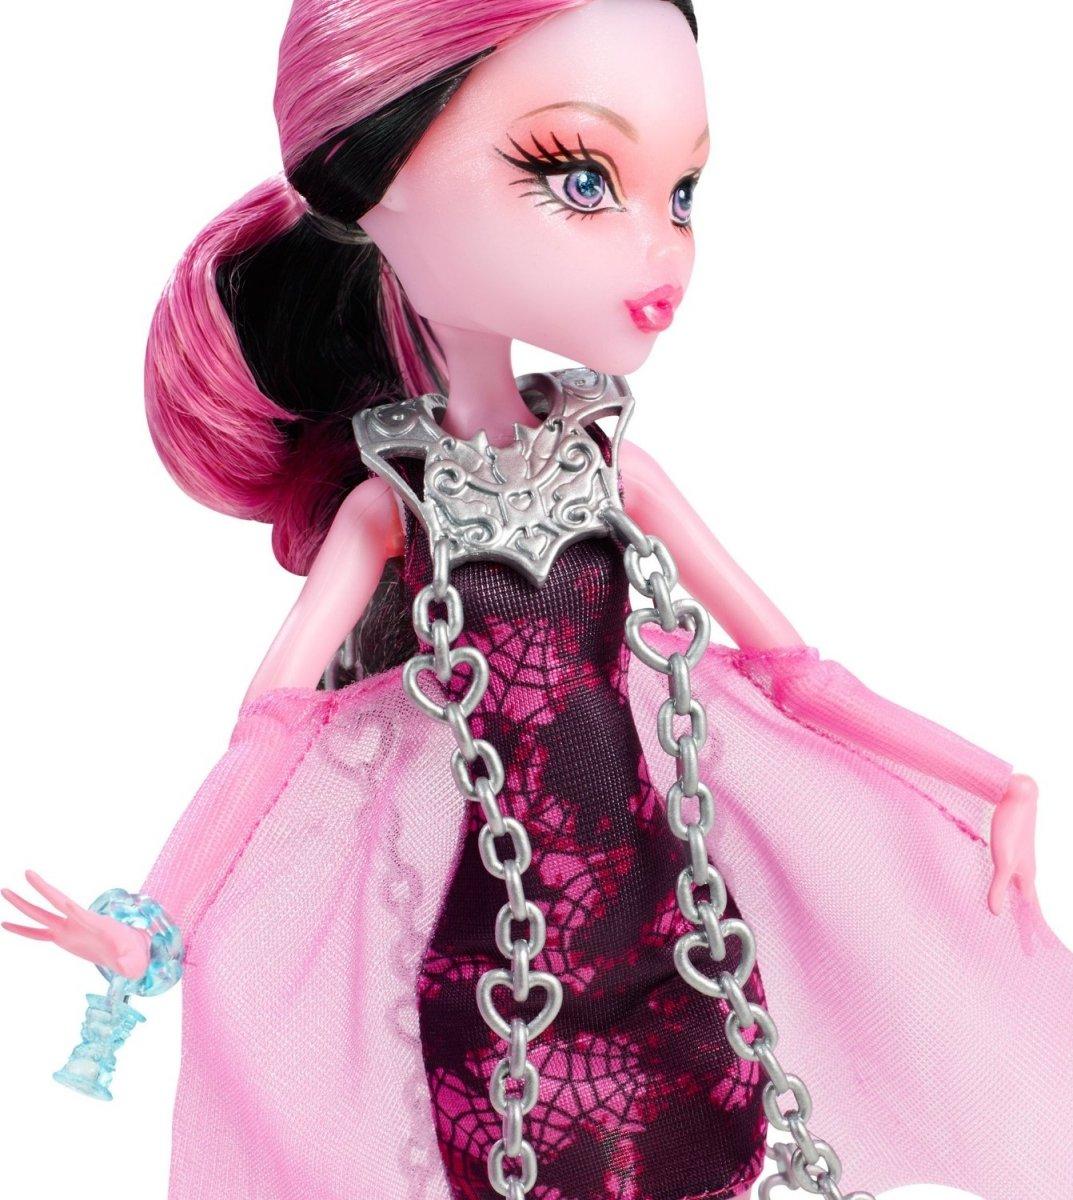 Кукла MONSTER HIGH Призрачные превращения - Дракулаура